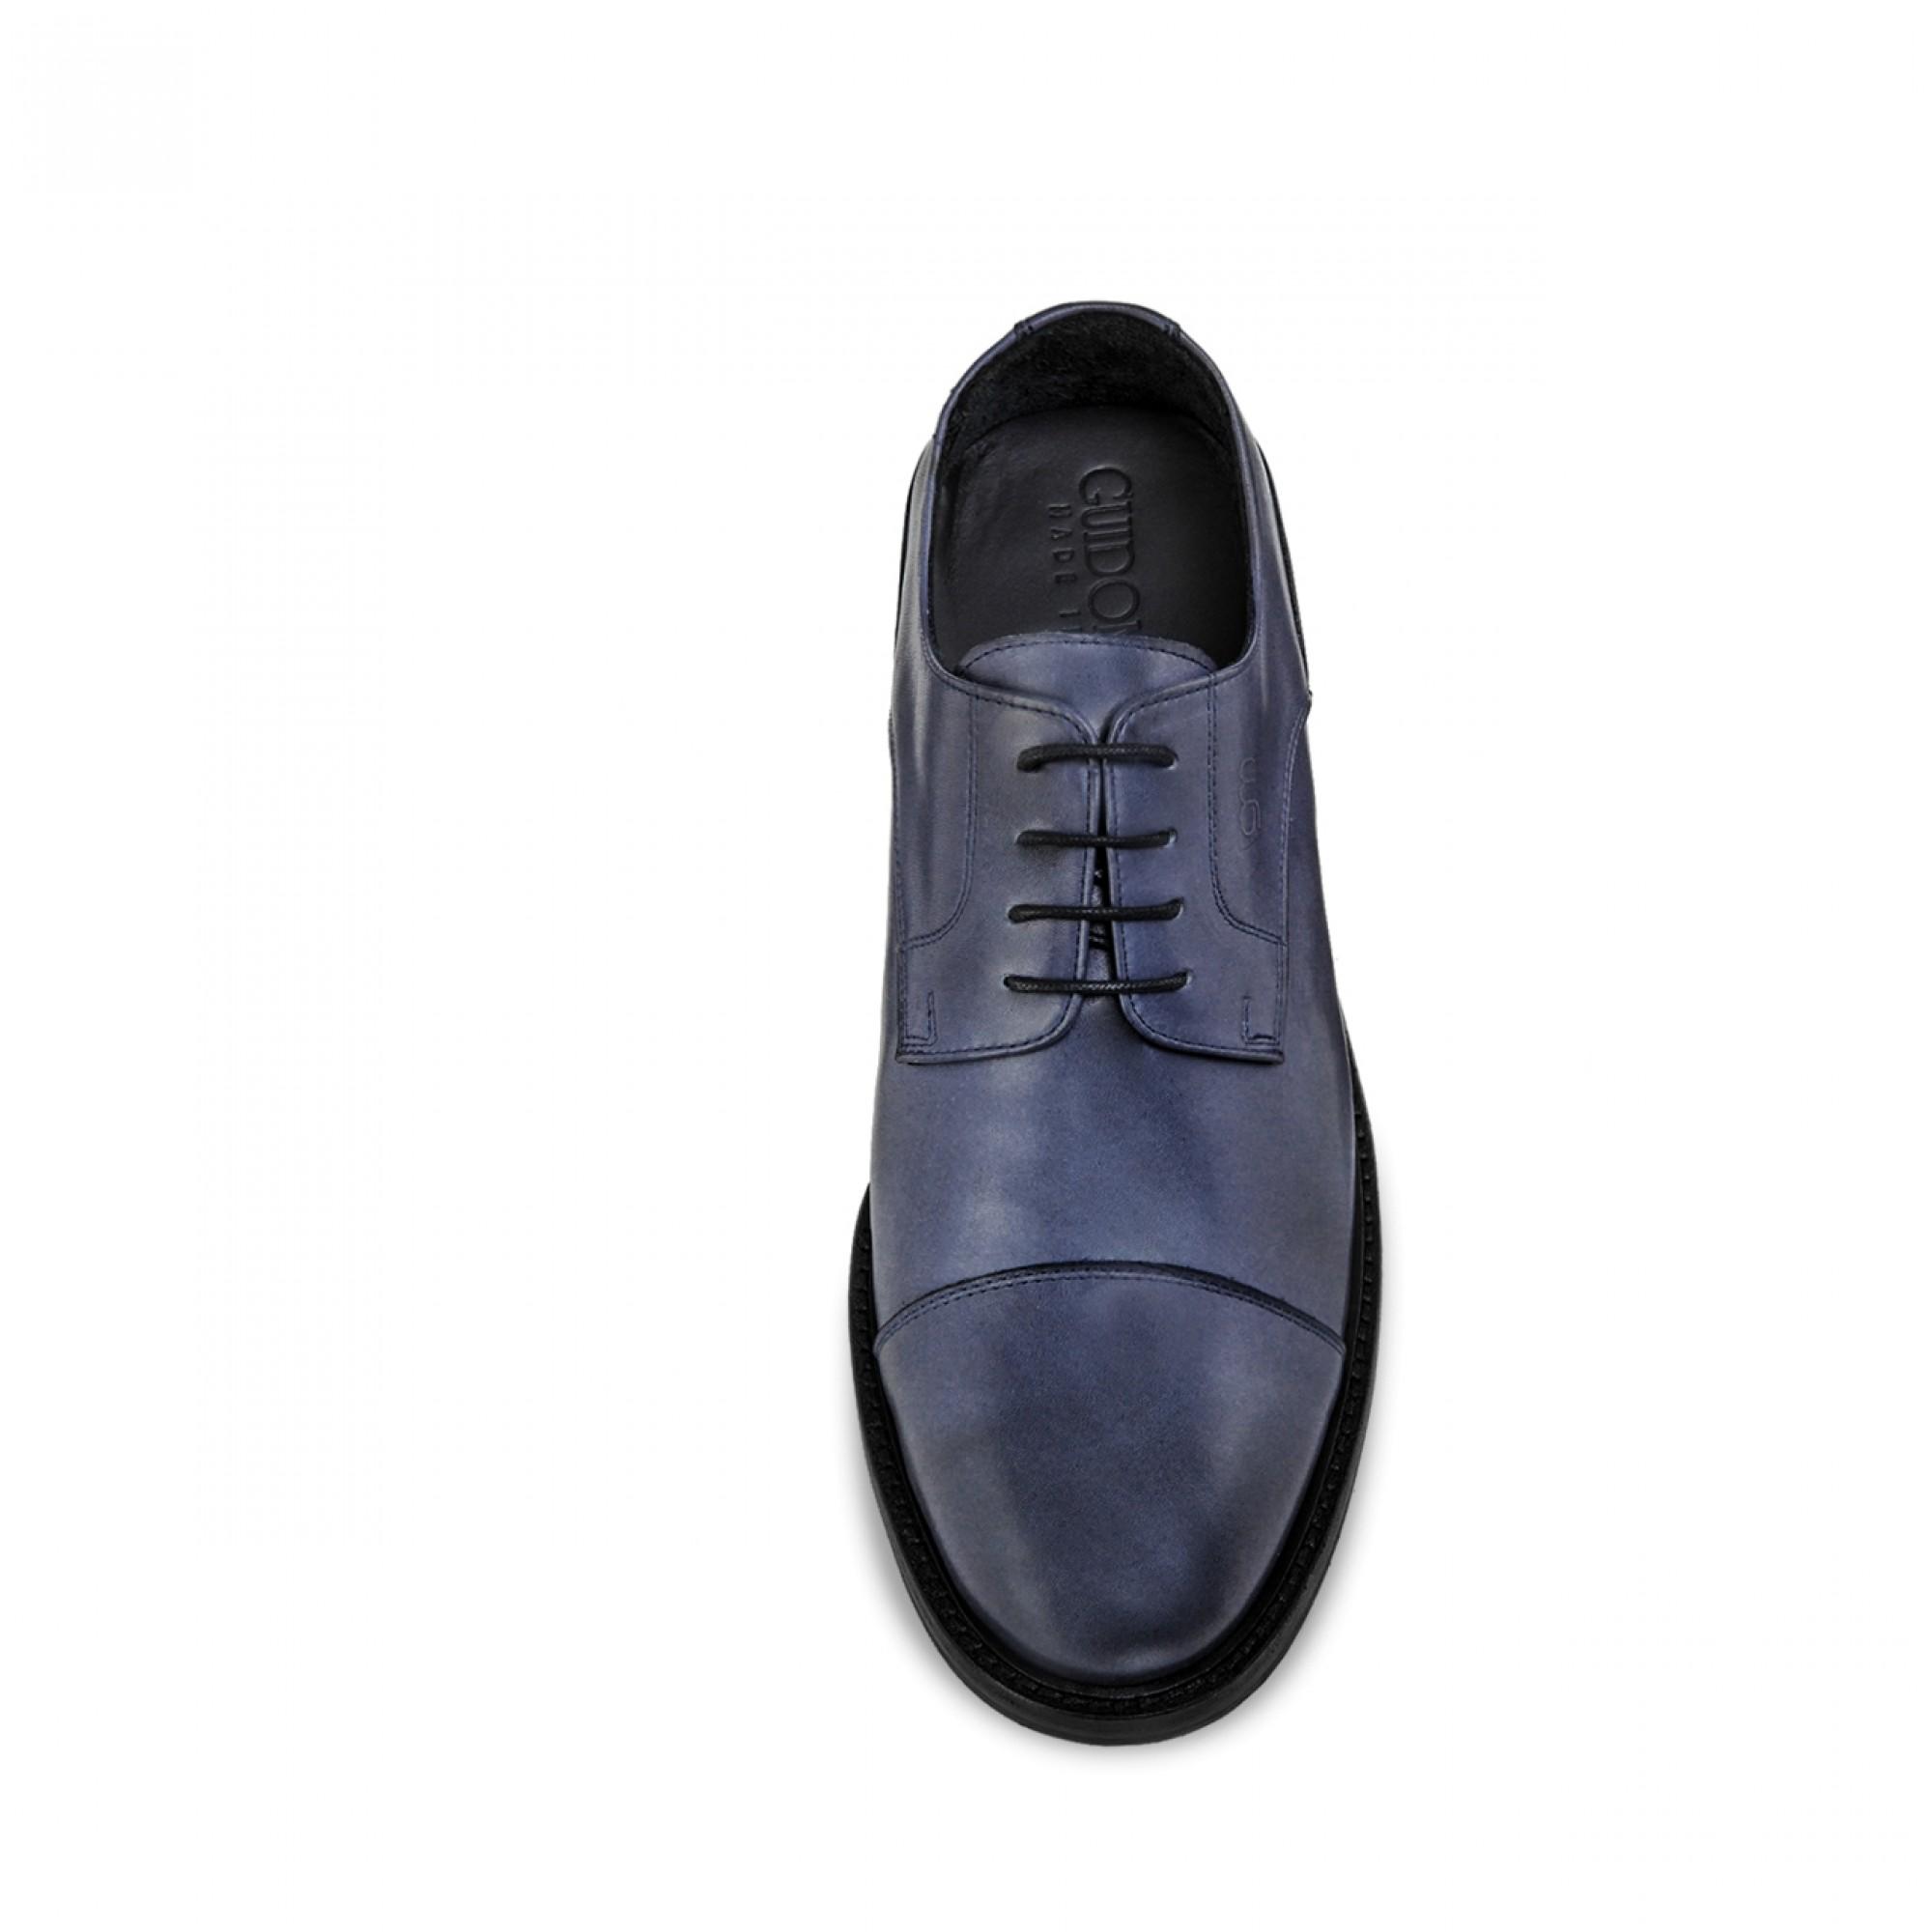 scarpe con rialzo dipinte a mano